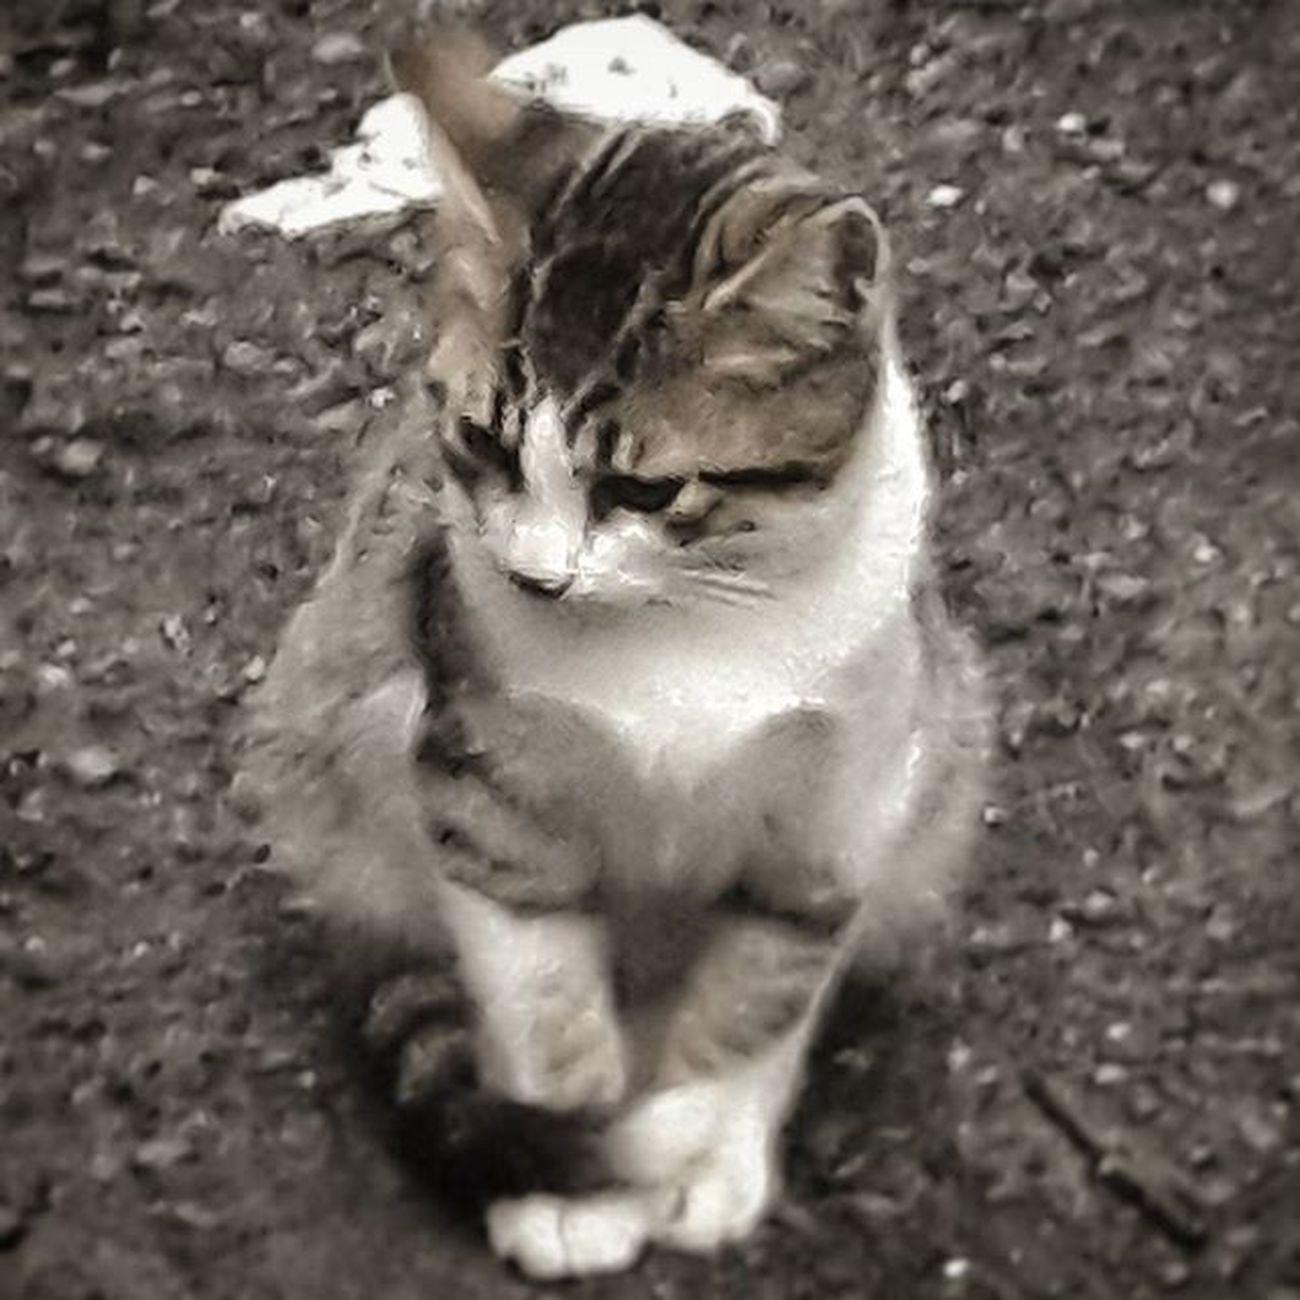 Cat Catstagram Animal Lovers Animal Cats_arround Love Lovely Cute Love_animals Cats_of_instagram Cats Animallover Kitty Kitten Save_animals Savethenature YouAreNotAlone Wearenotalone Instagram_turkey Instadaily Insta_people Instamood Instalike Instagram Instagood insta lightsout life citylife Beauty